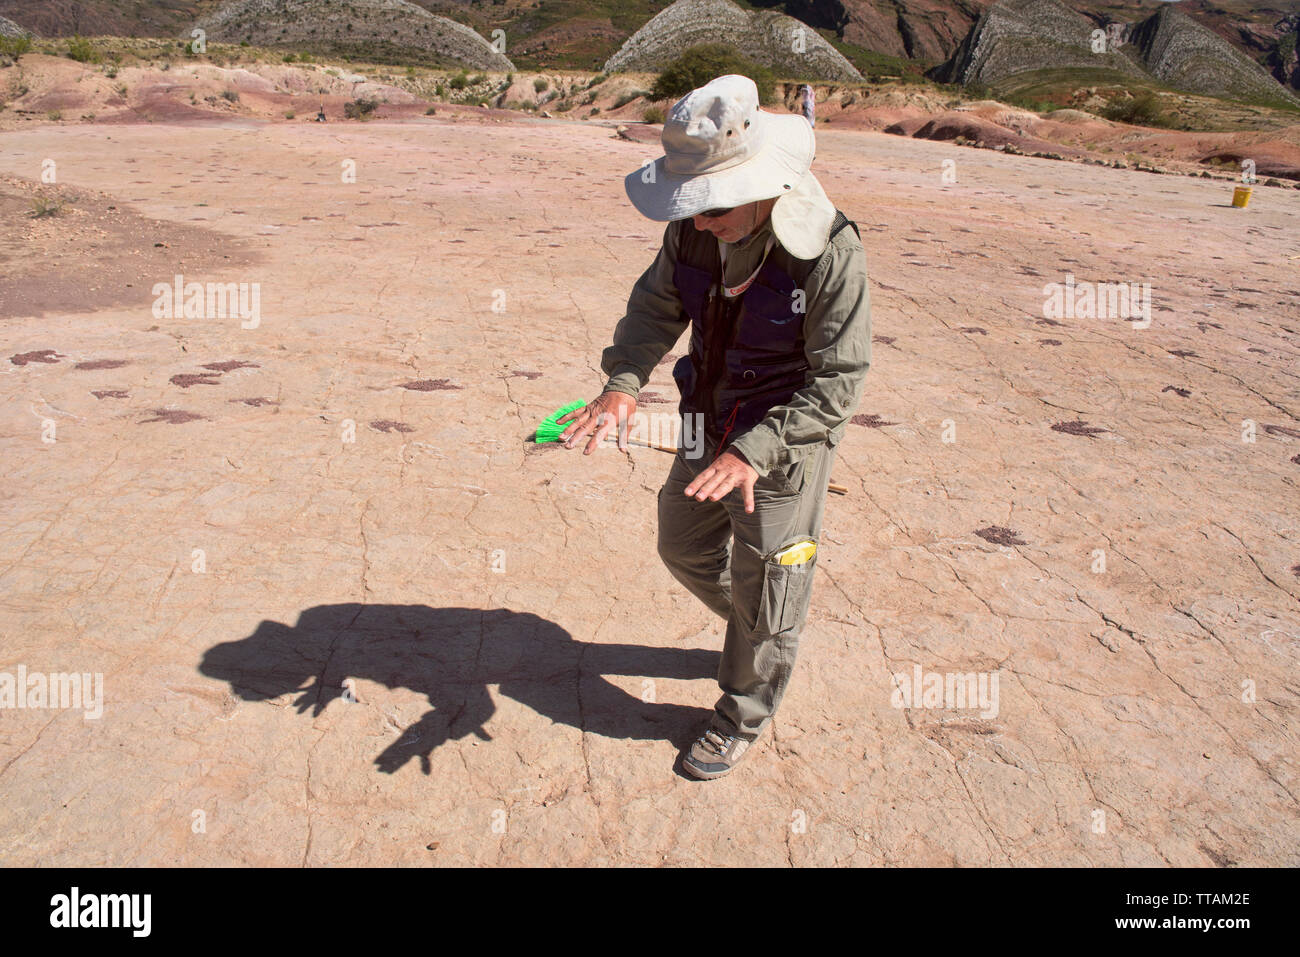 Paleontologist studying dinosaur footprints in Torotoro National Park, Torotoro, Bolivia Stock Photo